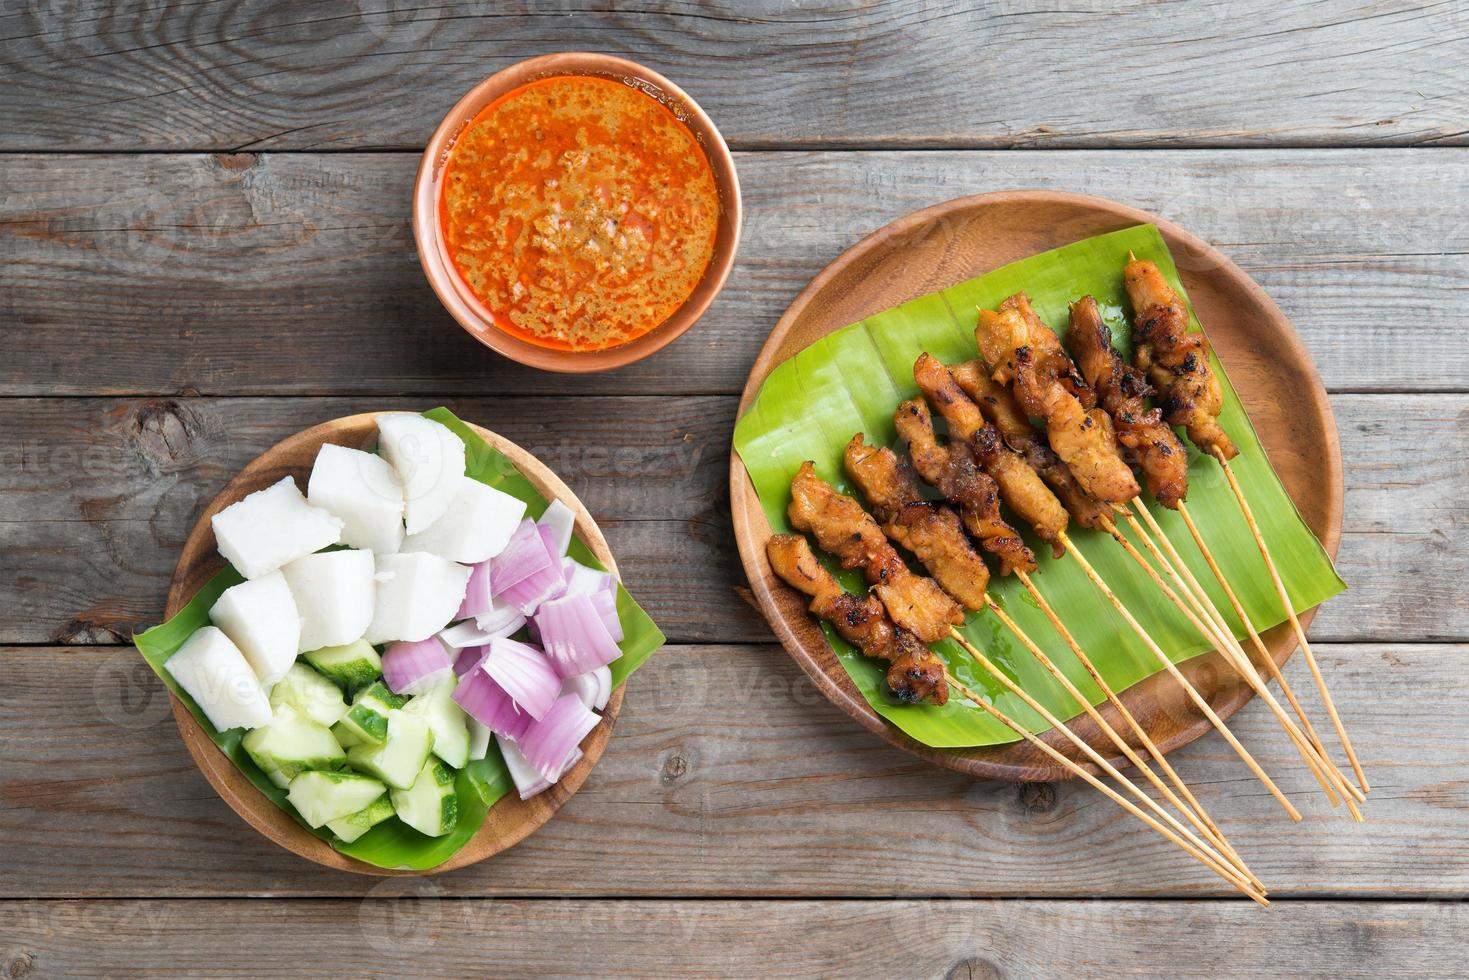 poulet malaisien photo